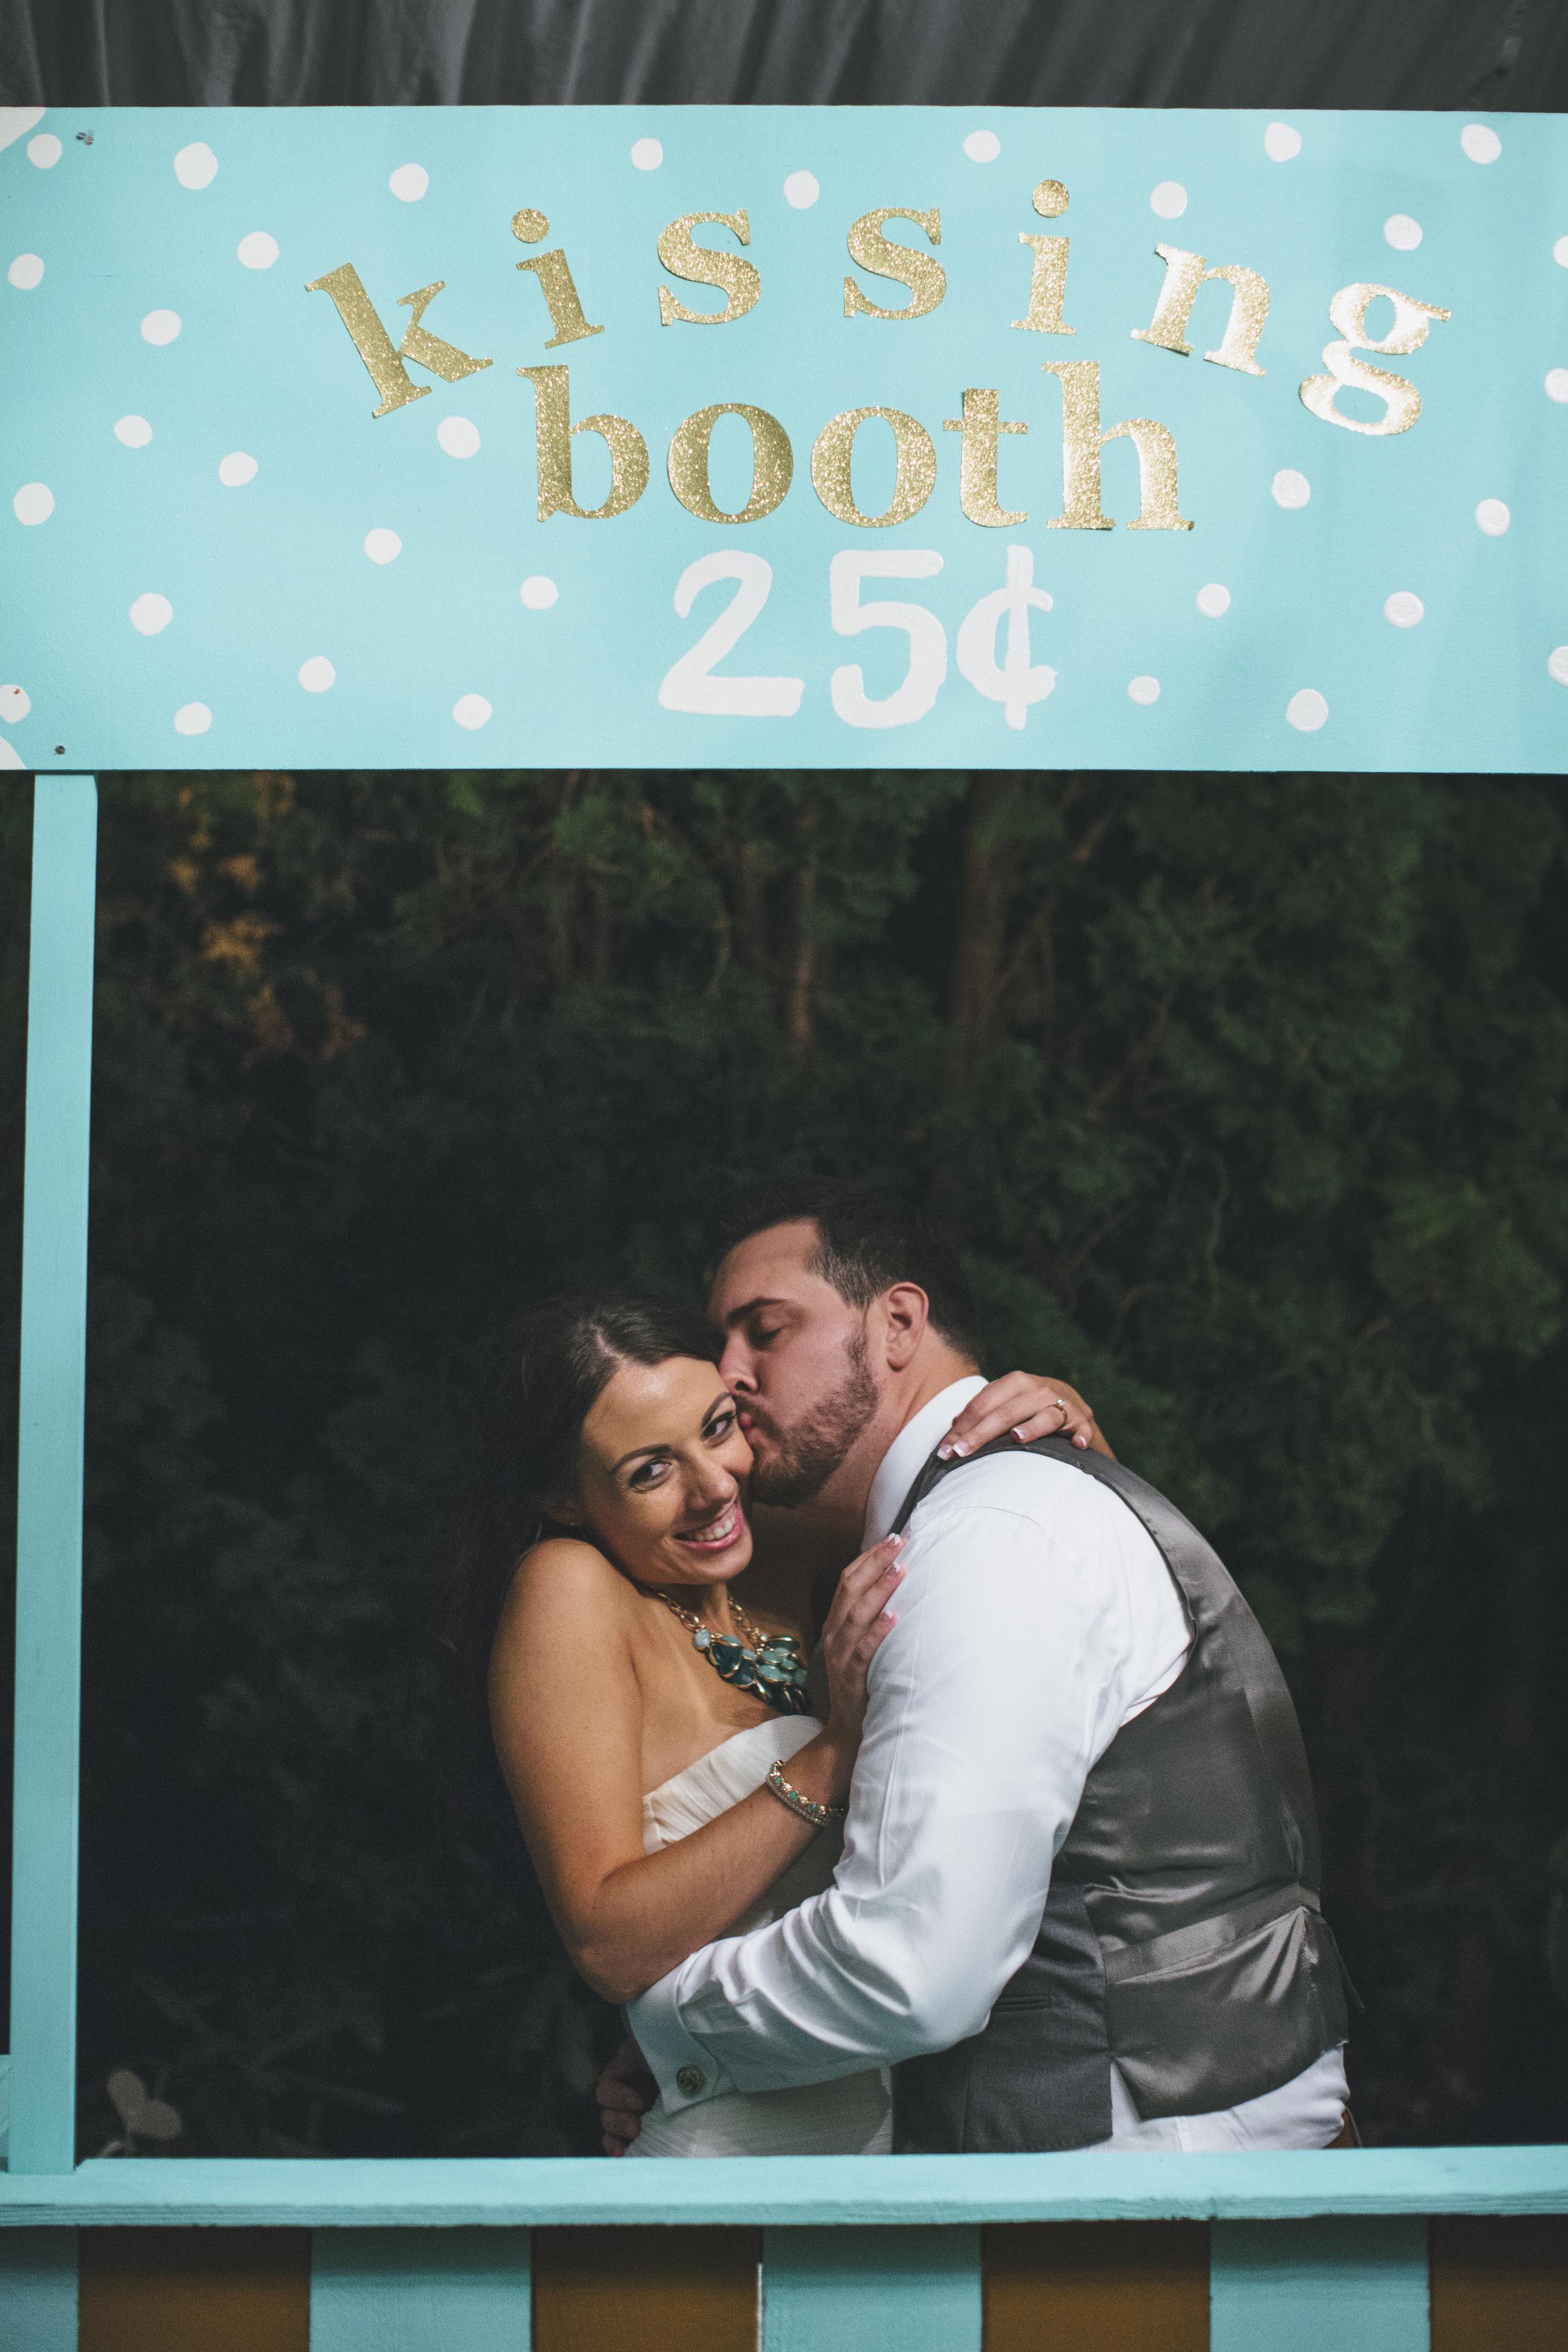 Teal Wedding Kissing Booth Idea